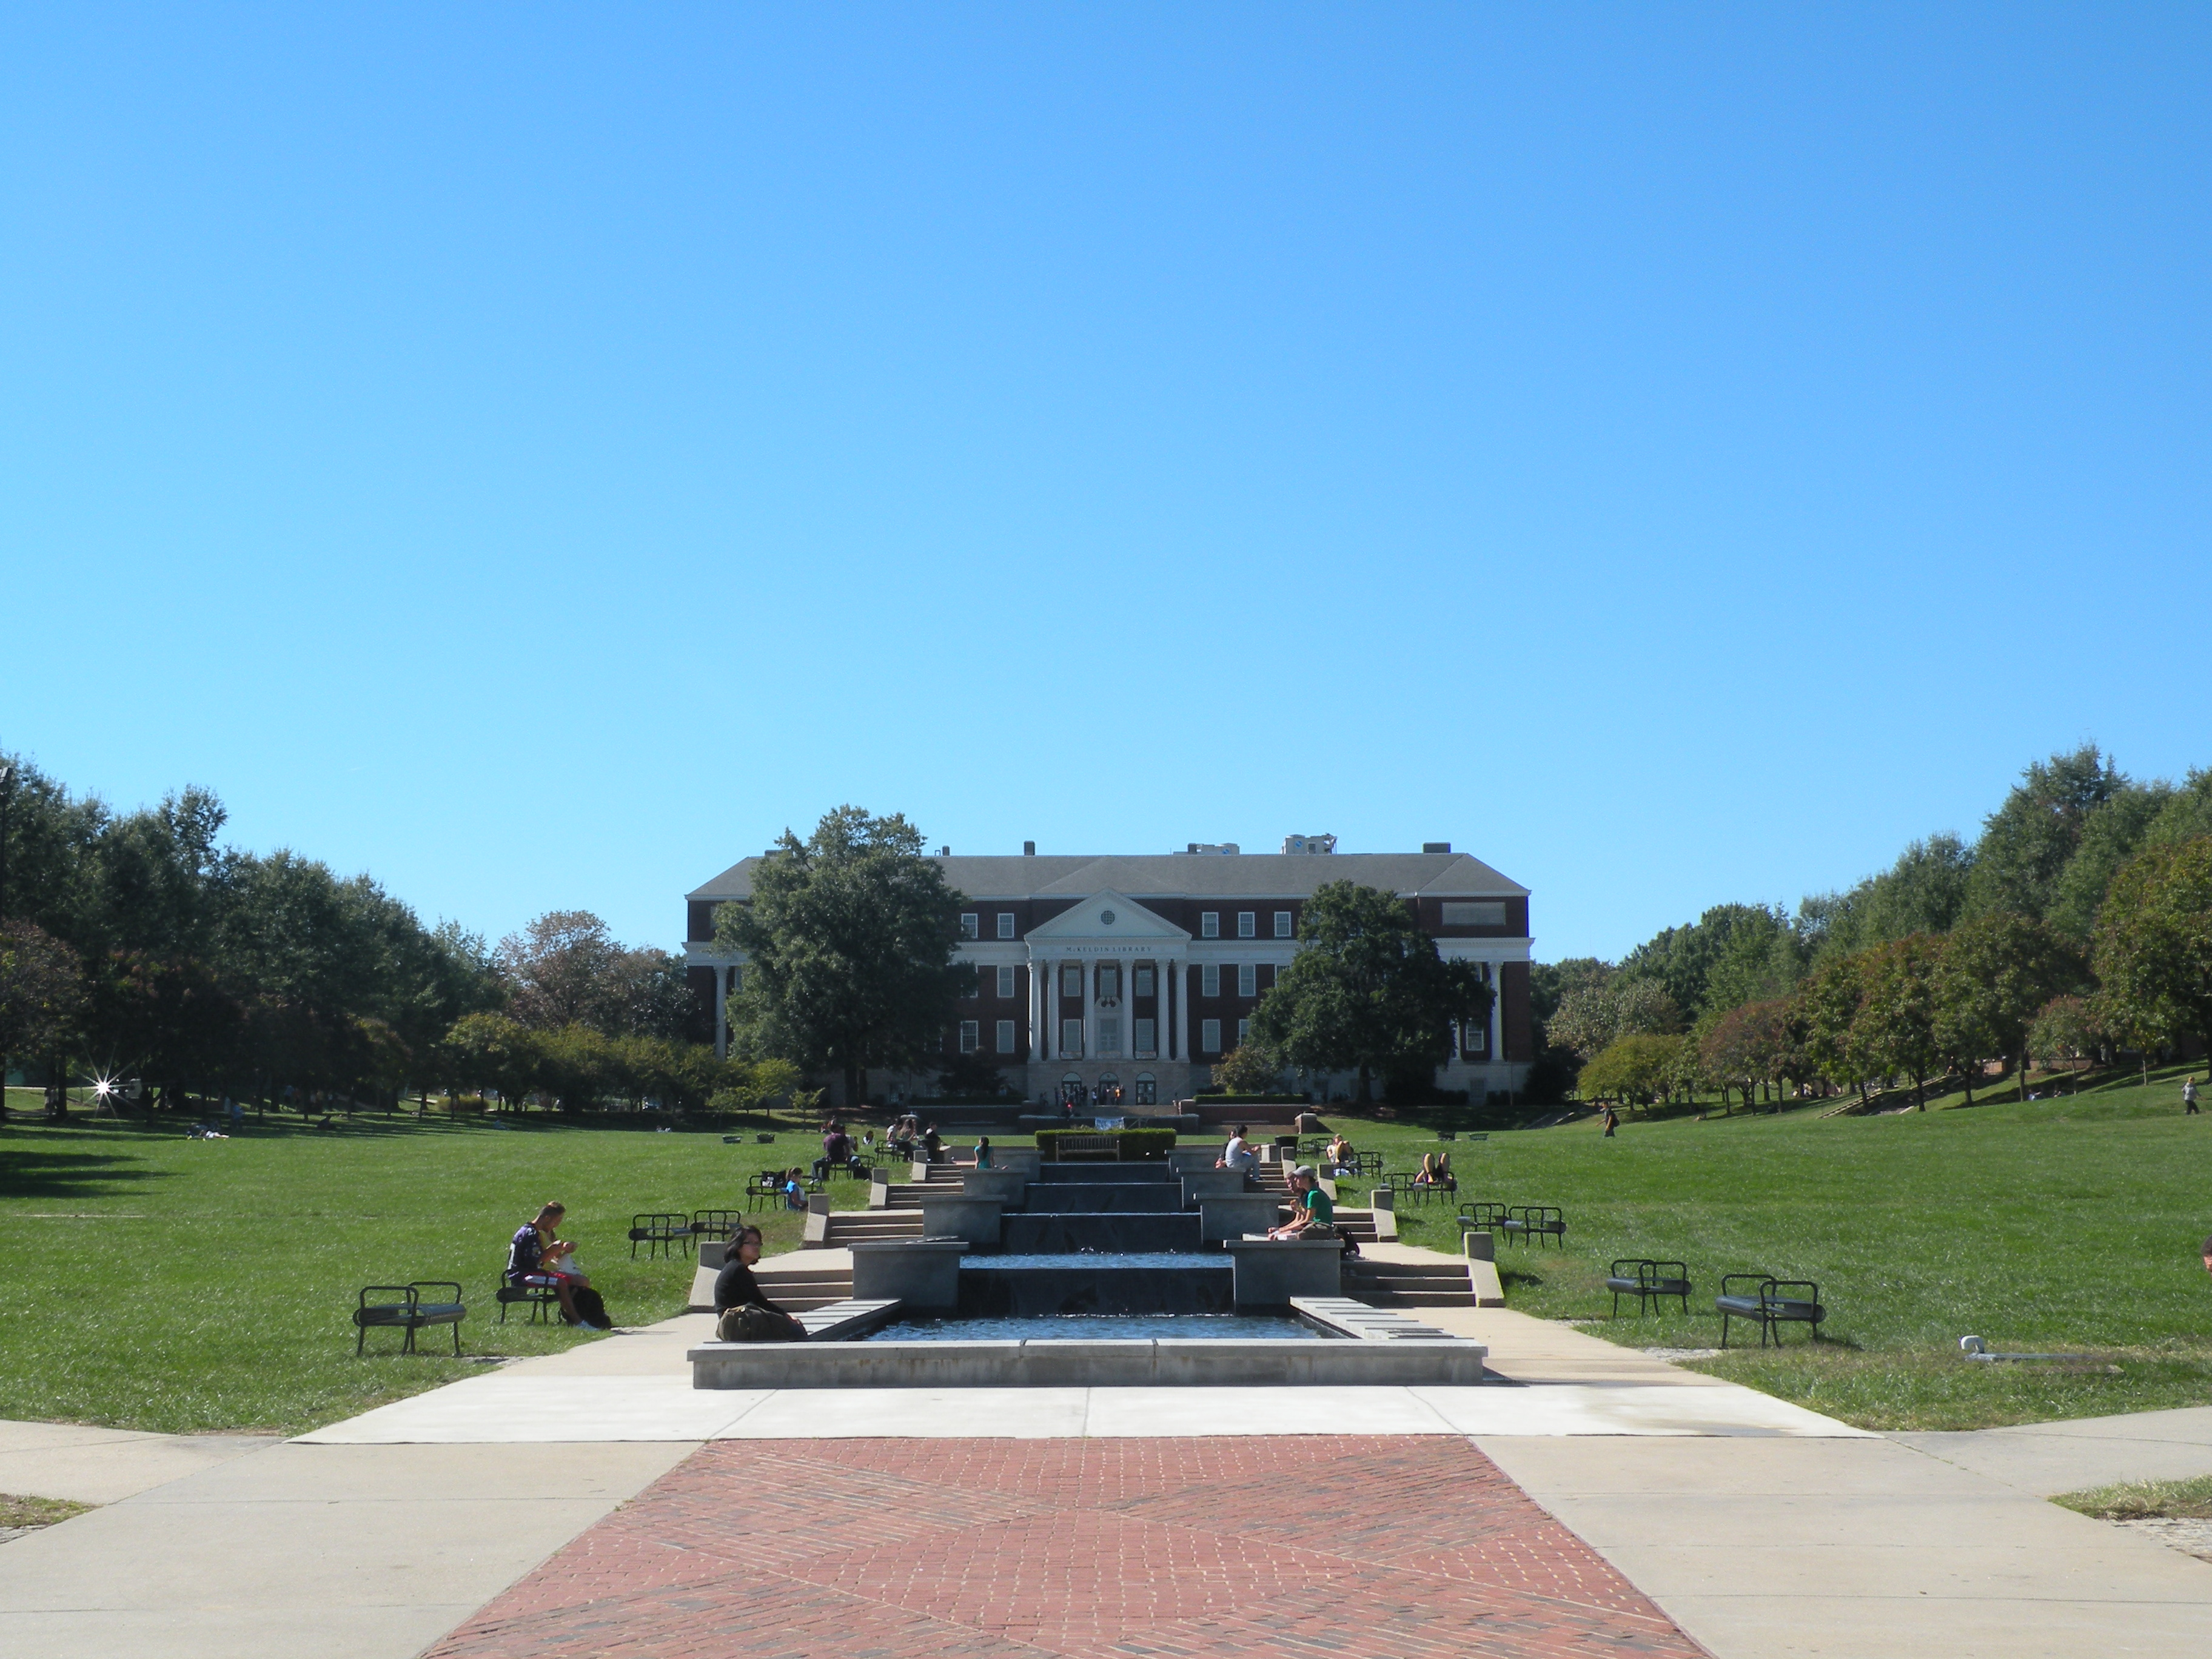 Description University of Maryland McKeldin Library 5063343578jpg 3648x2736